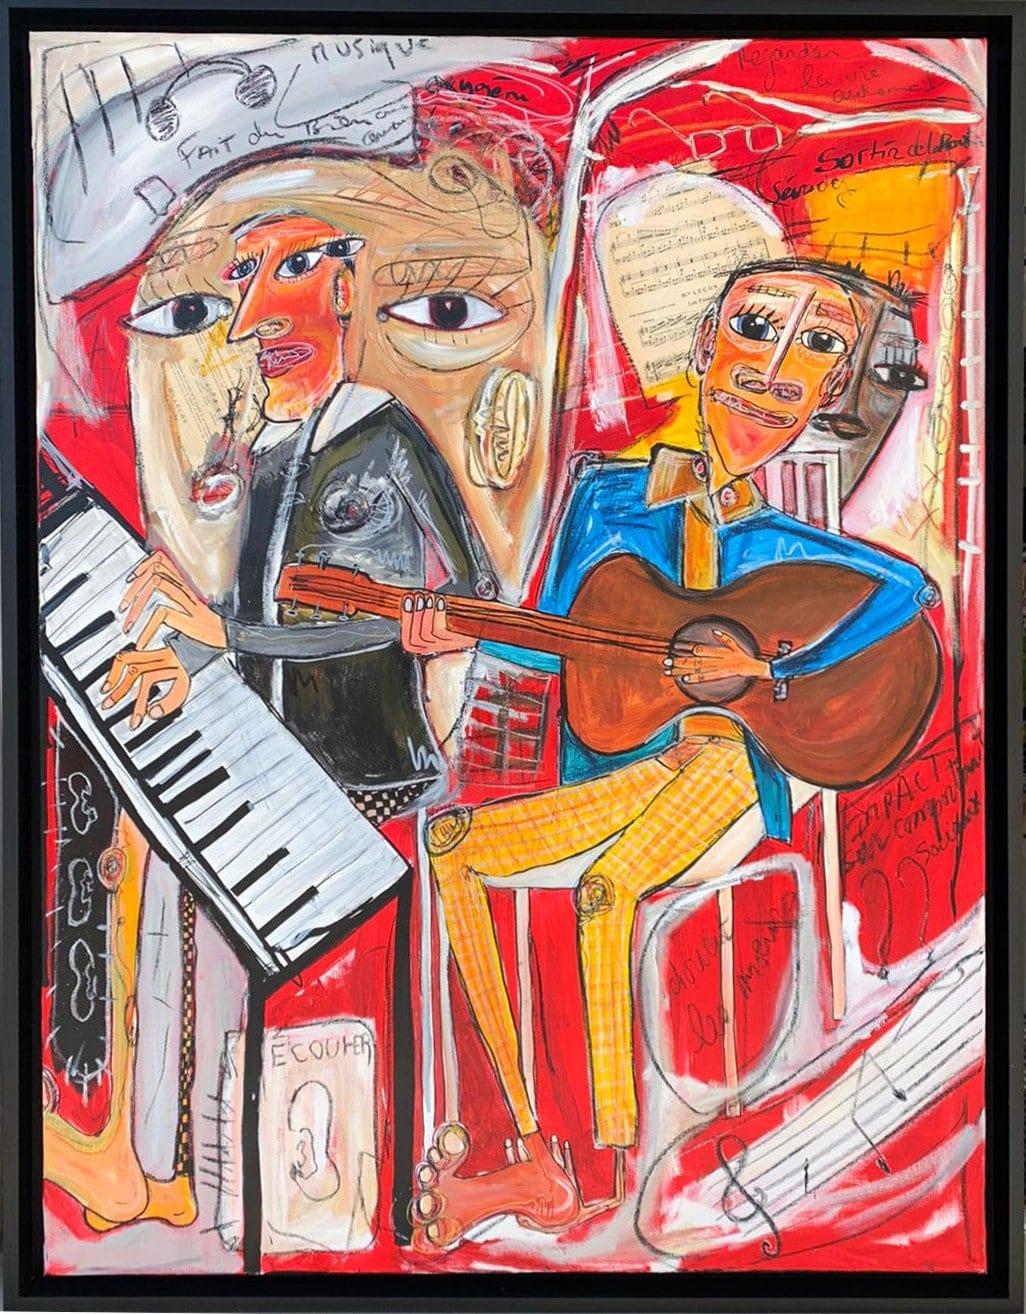 Rencontre – Martine Coloos, artiste peintre – Samedi 18 juillet